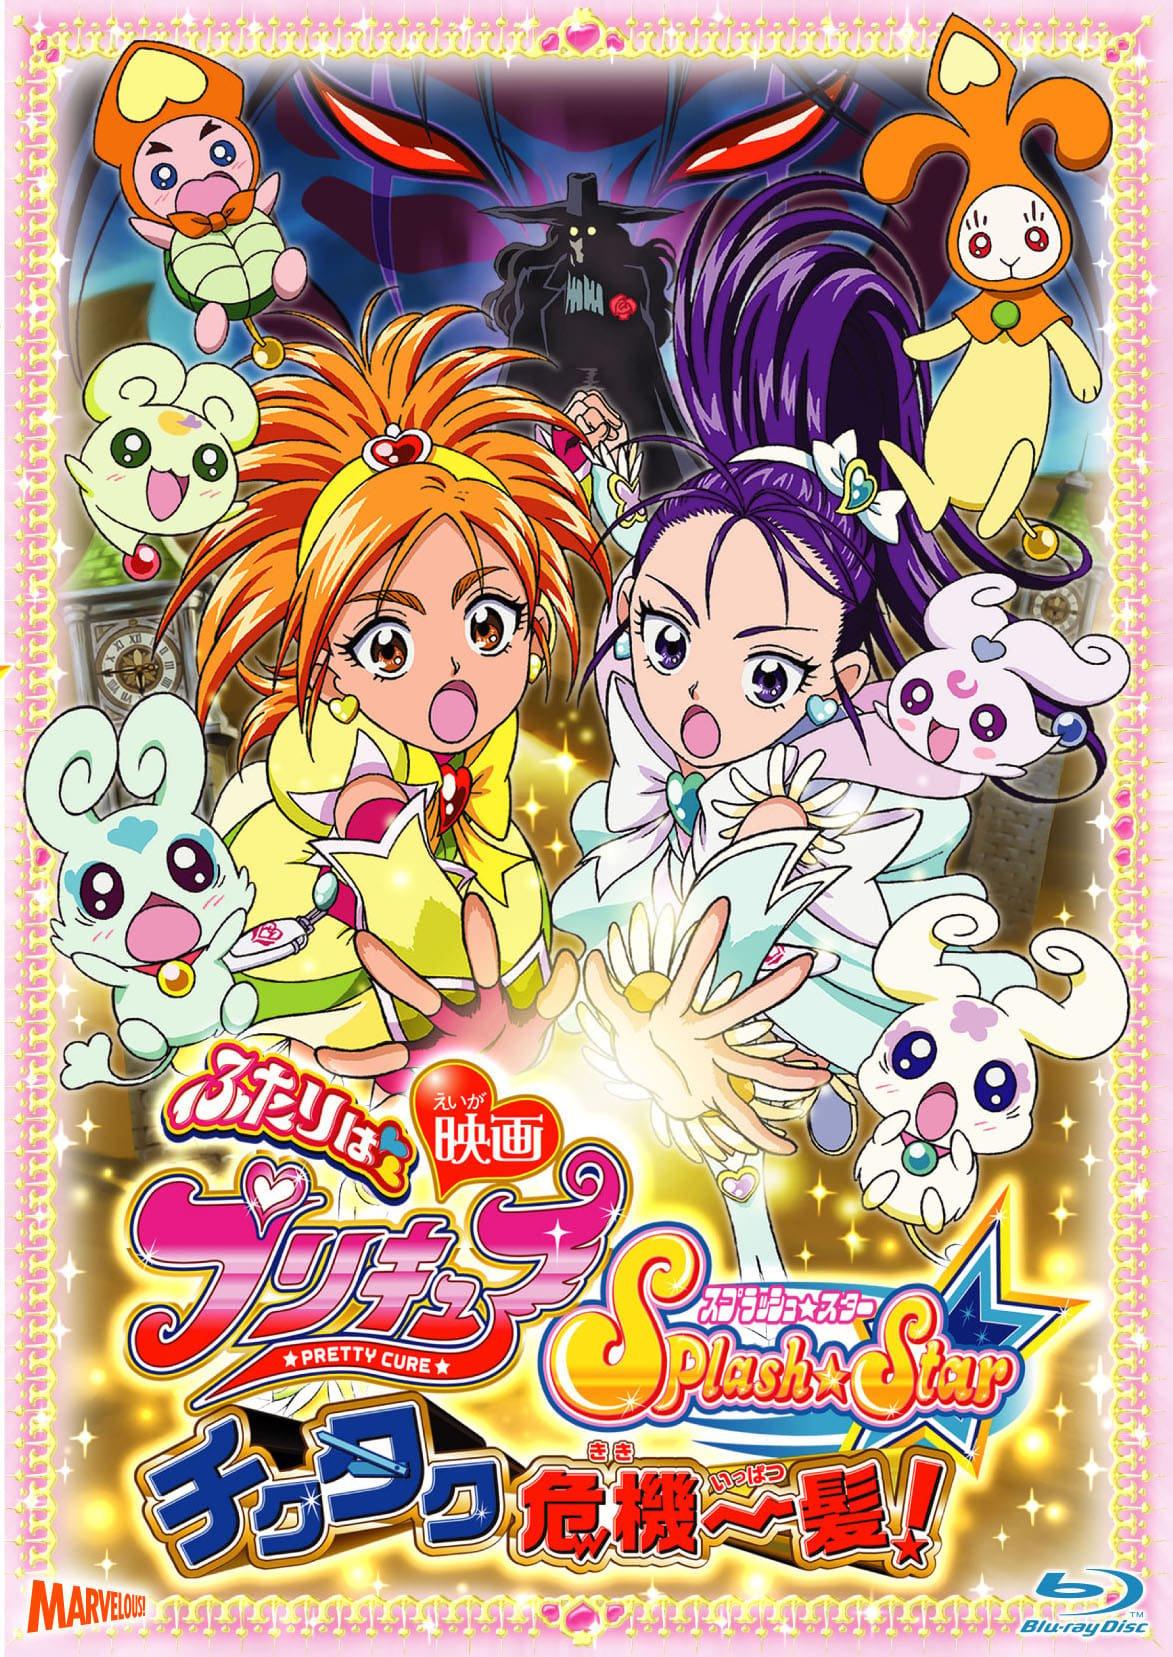 Pretty Cure Movie 3 Splash Star Tic-Tac Crisis Hanging by a Thin Thread!